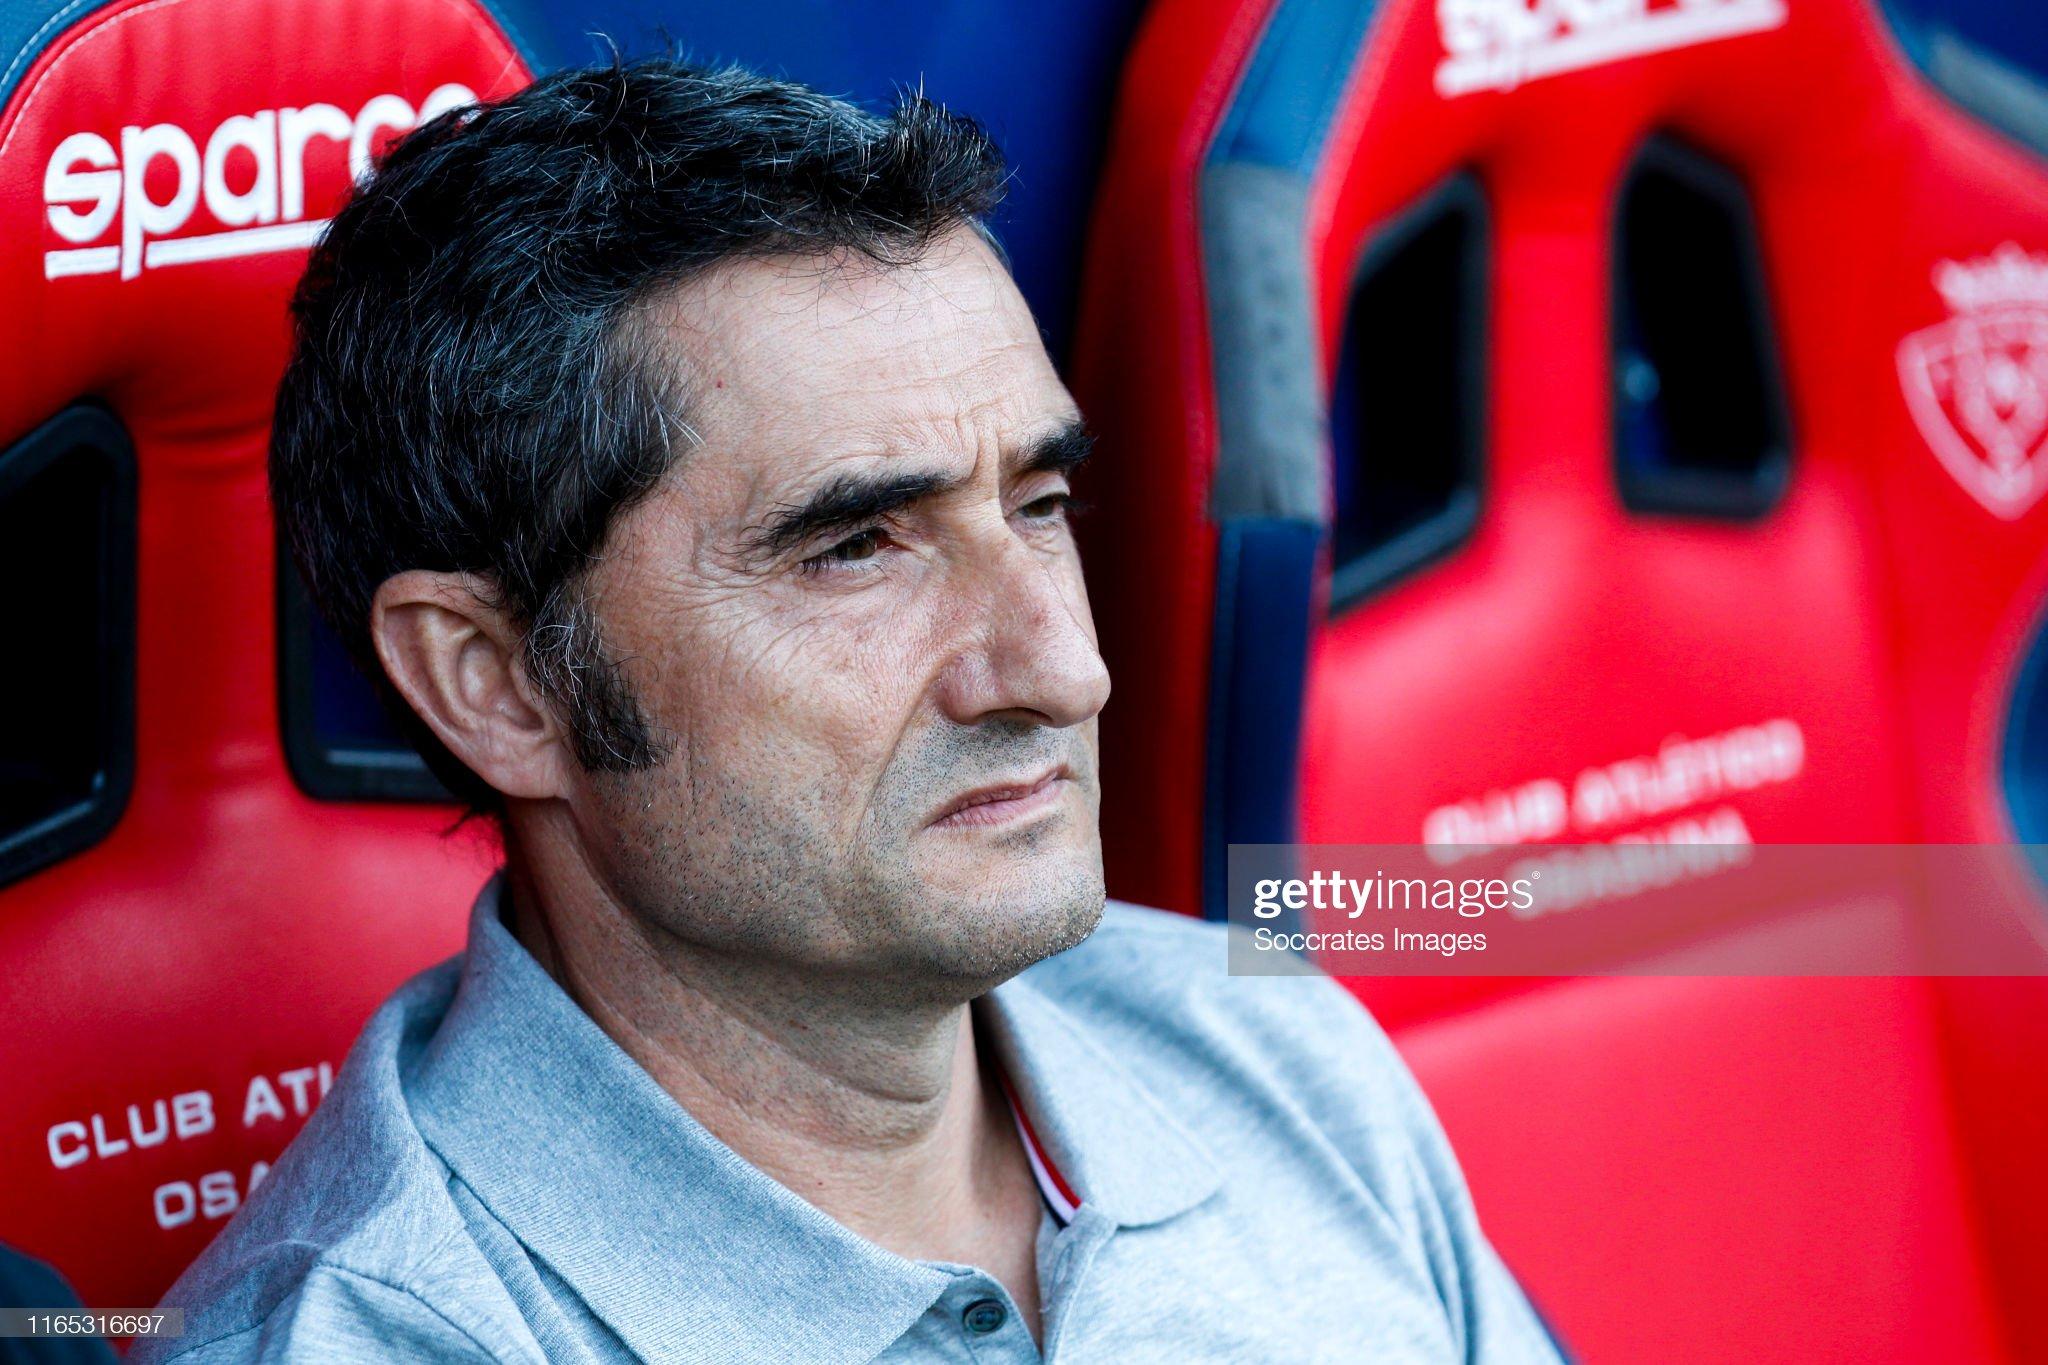 صور مباراة : أوساسونا - برشلونة 2-2 ( 31-08-2019 )  Coach-ernesto-valverde-of-fc-barcelona-during-the-la-liga-santander-picture-id1165316697?s=2048x2048